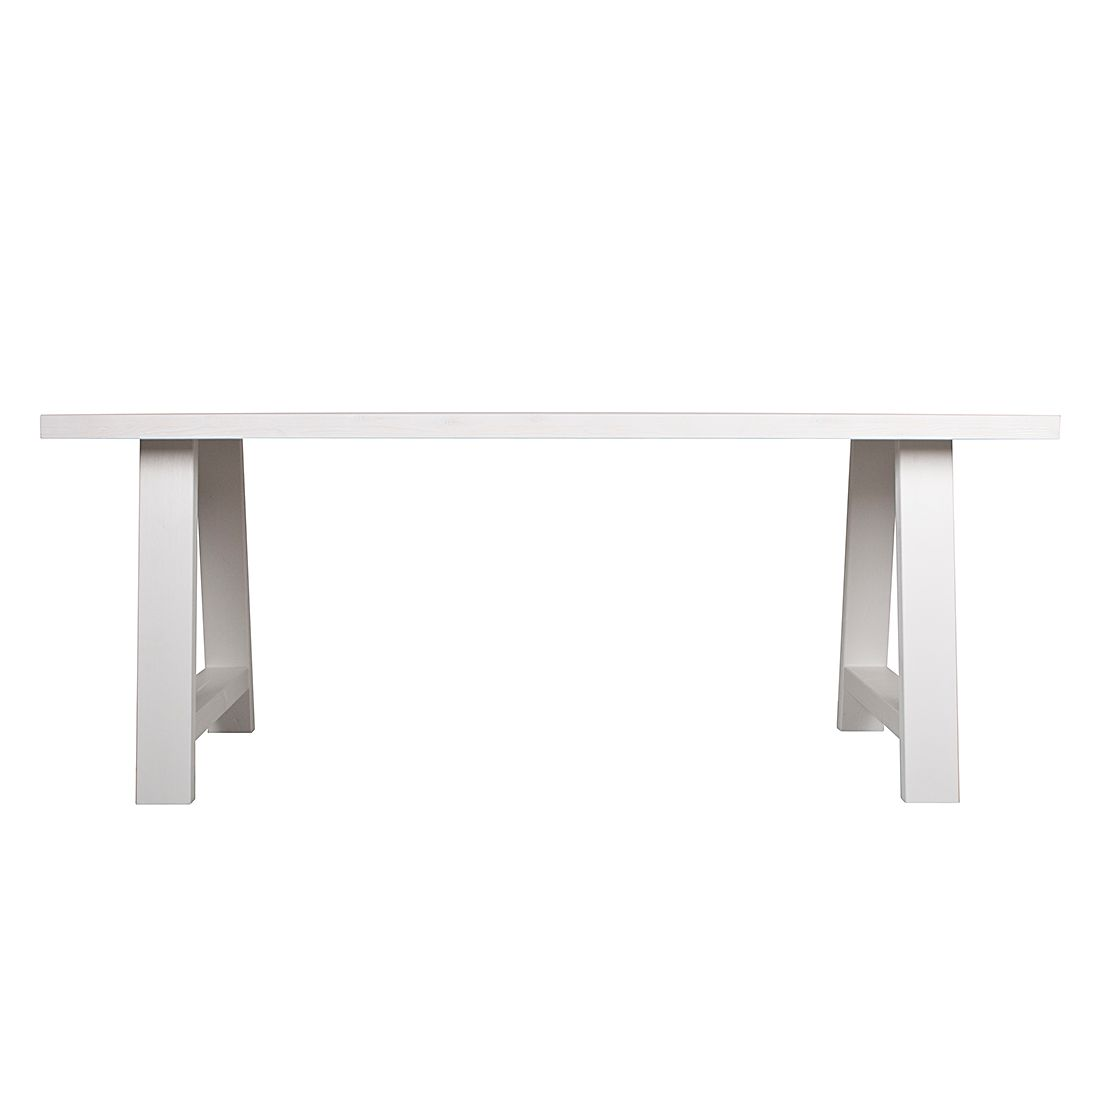 Esstisch A-framed - Kiefer massiv - Weiß - 180 x 85 cm, Zuiver